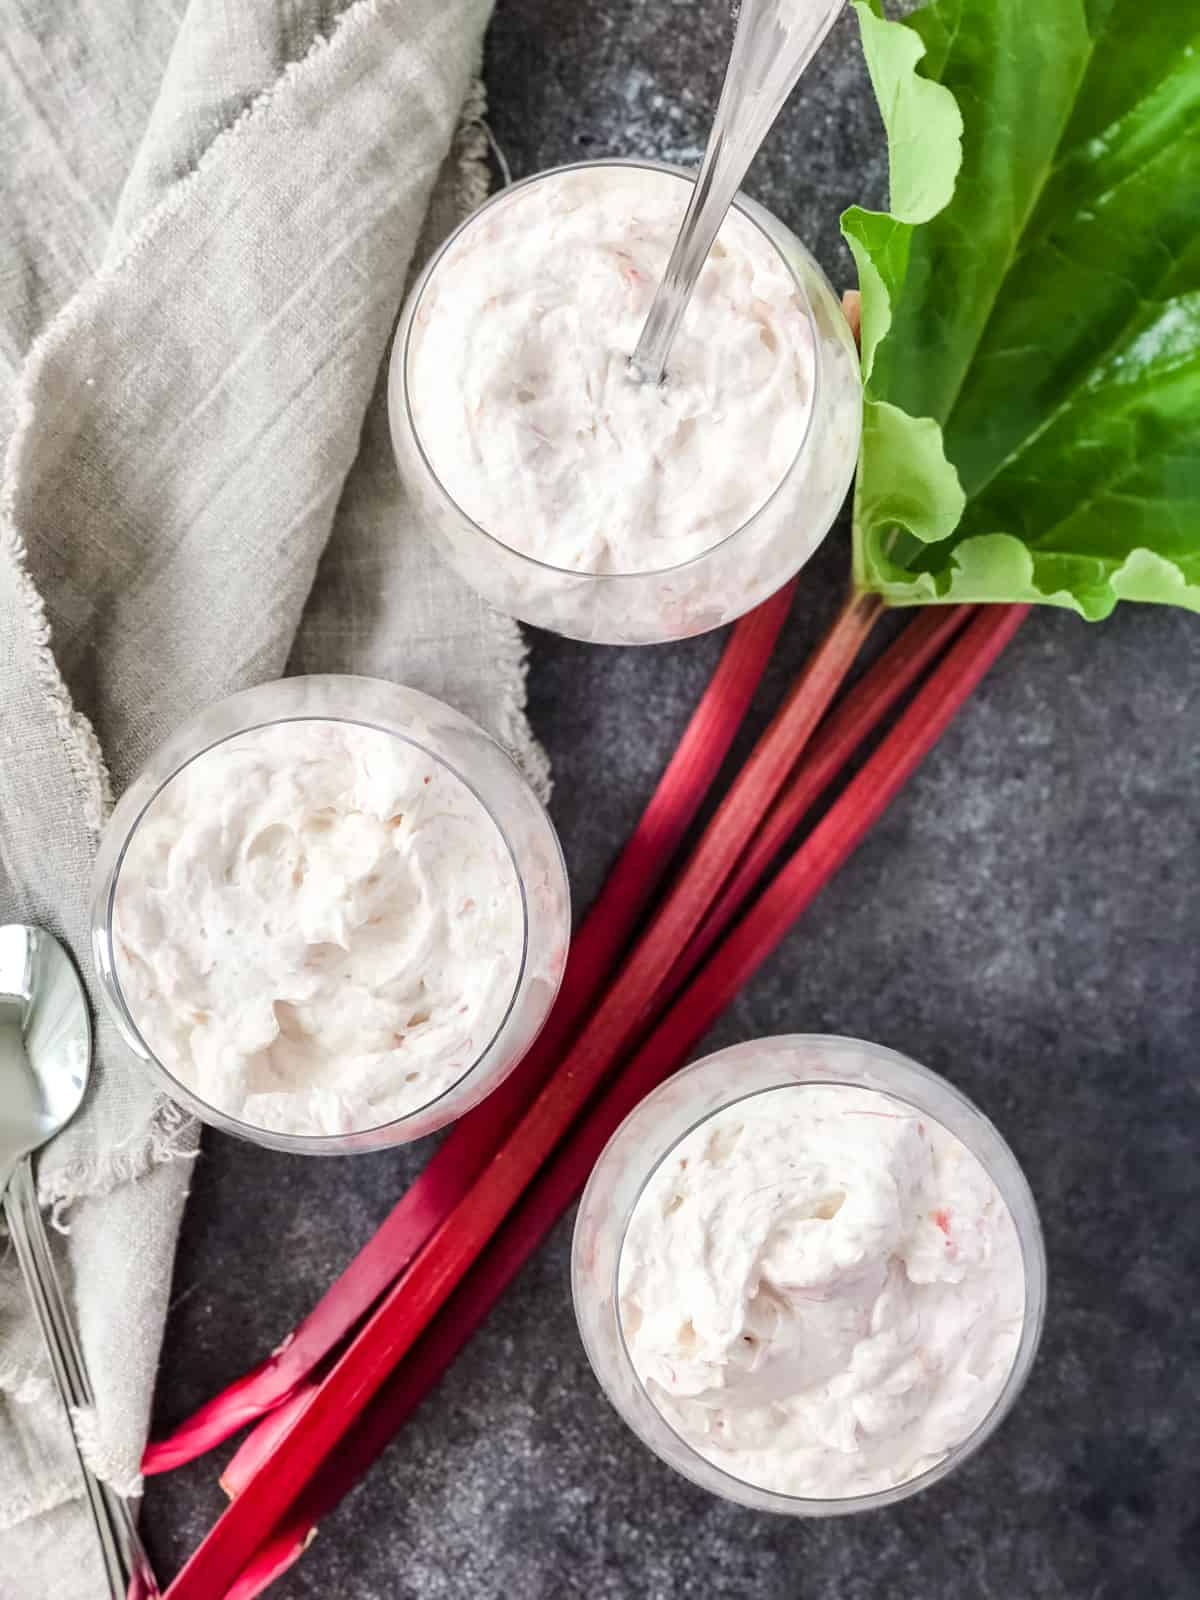 Cups of Rhubarb Cloud Dessert